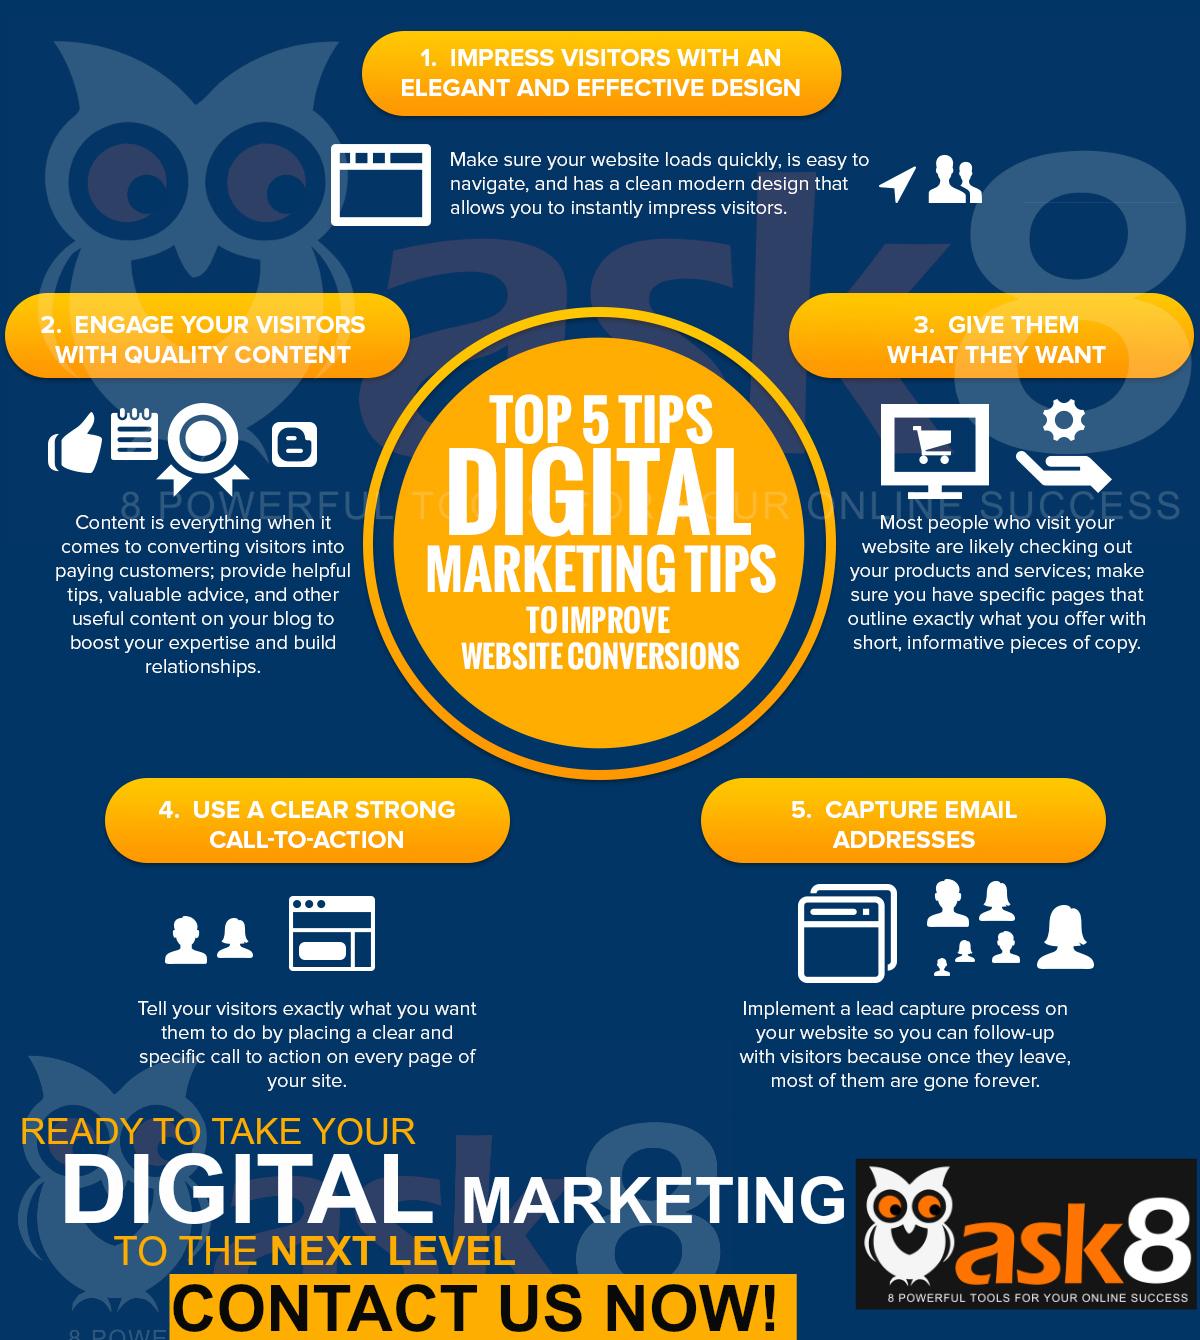 TOP 5 Digital Marketing Tips To Improve Website Conversions